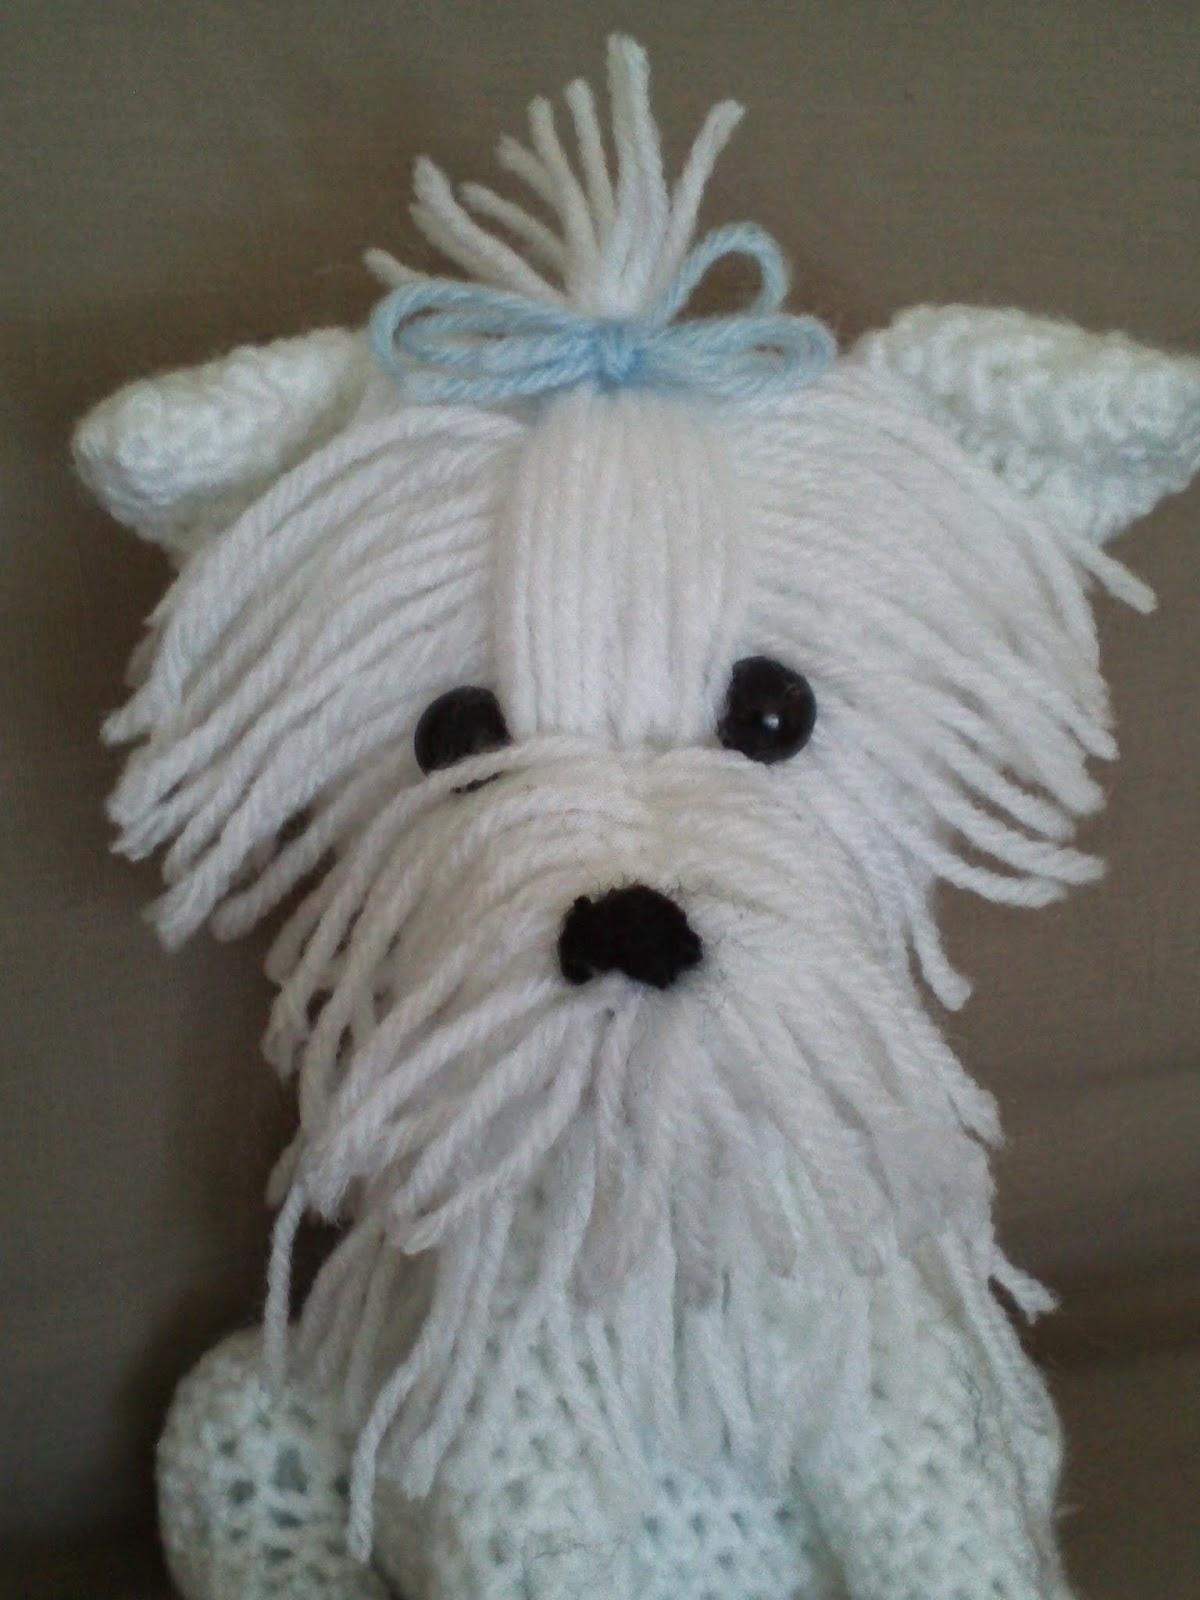 Maltese Crochet Patterns : Creative Crochet Designs: Crochet Maltese Terrier Amigurumi